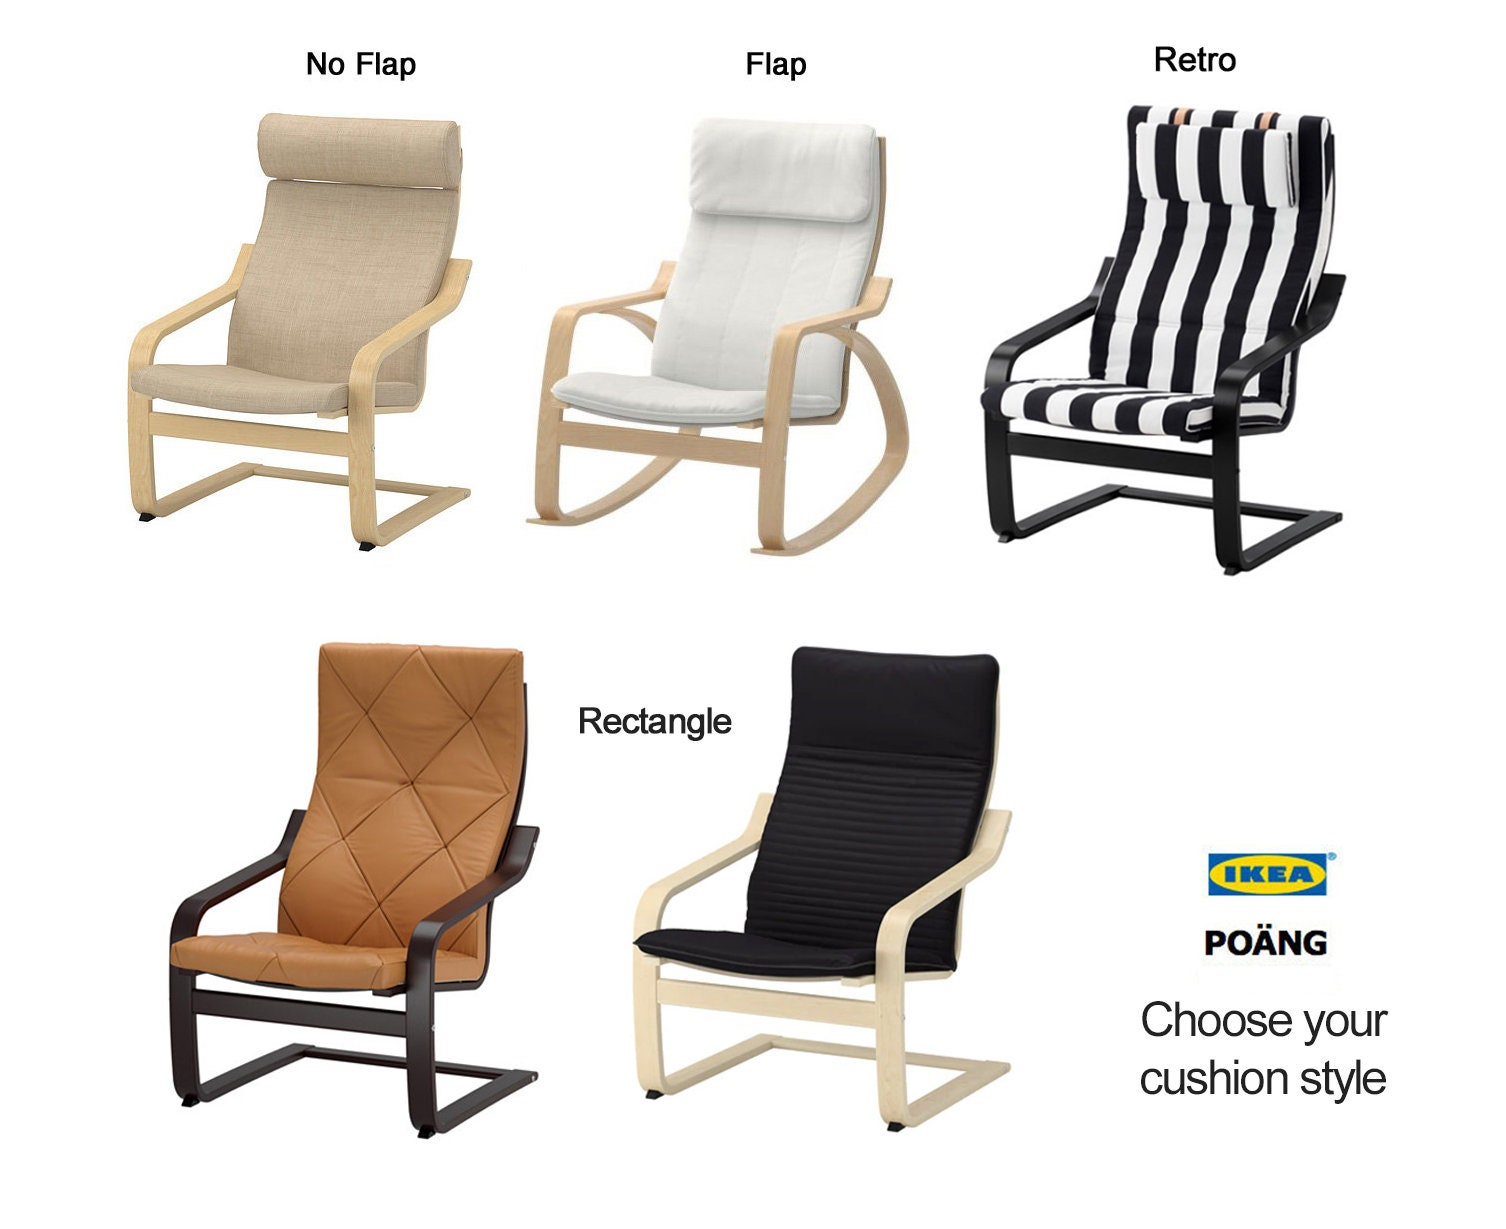 Sensational Yellow Vine Bold Pattern Ikea Poang Chair Cover Evergreenethics Interior Chair Design Evergreenethicsorg